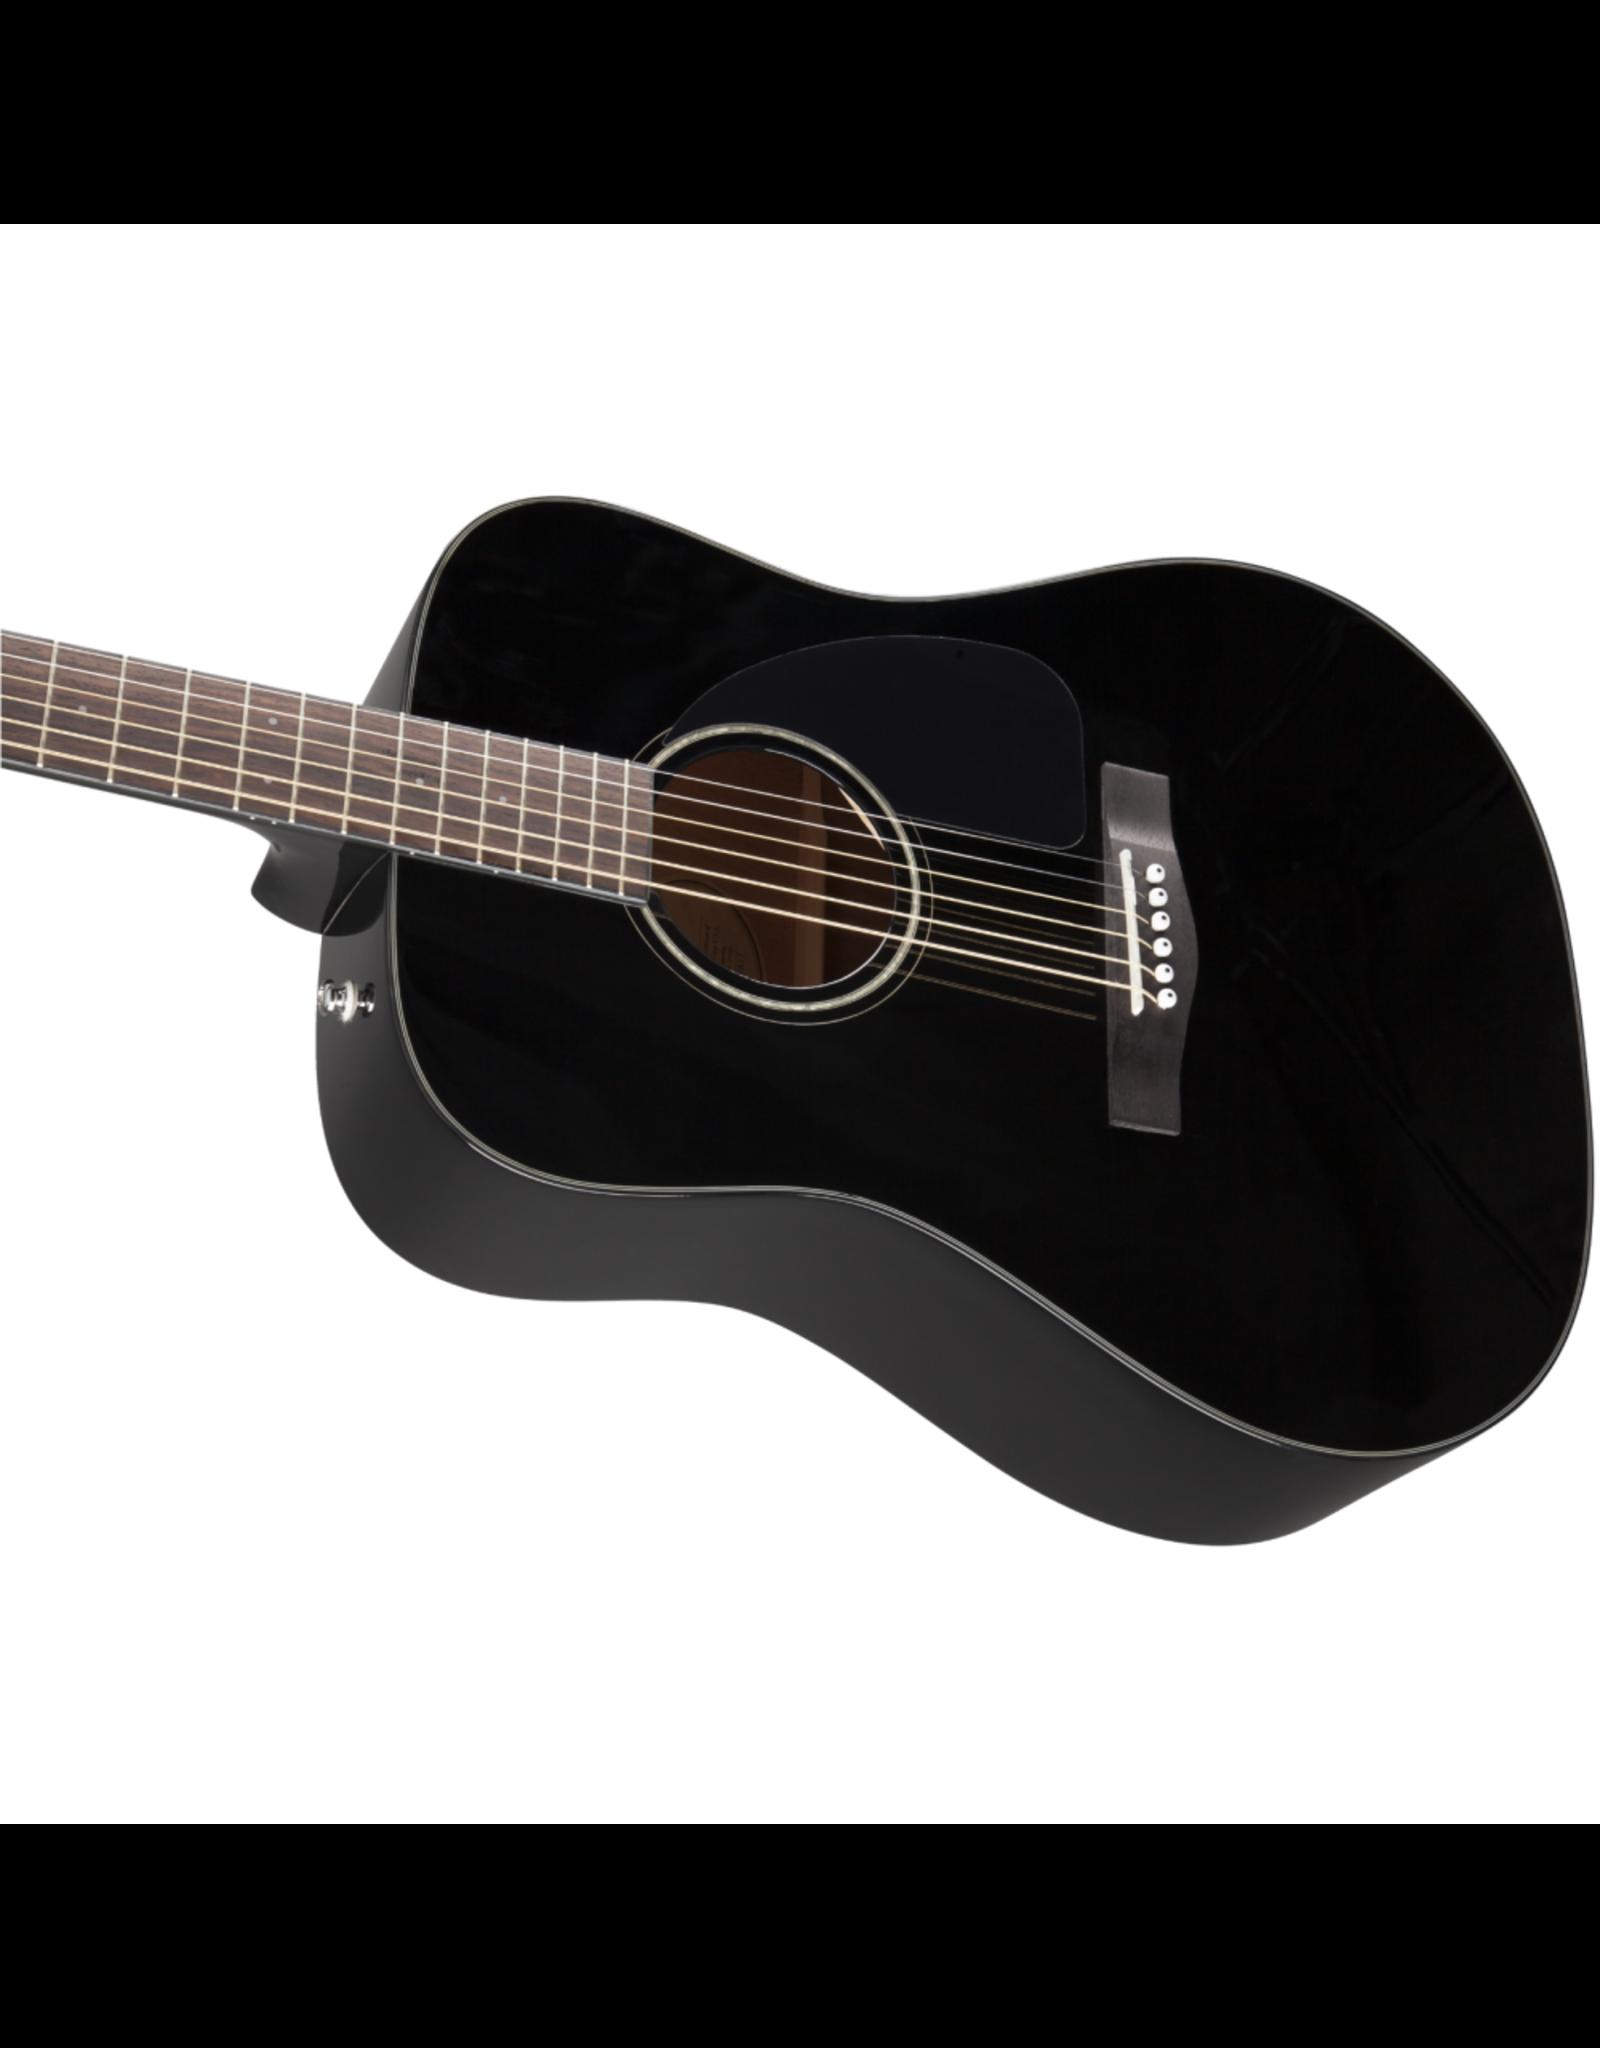 Fender Fender CD-60 V3 Laminated Spruce Black